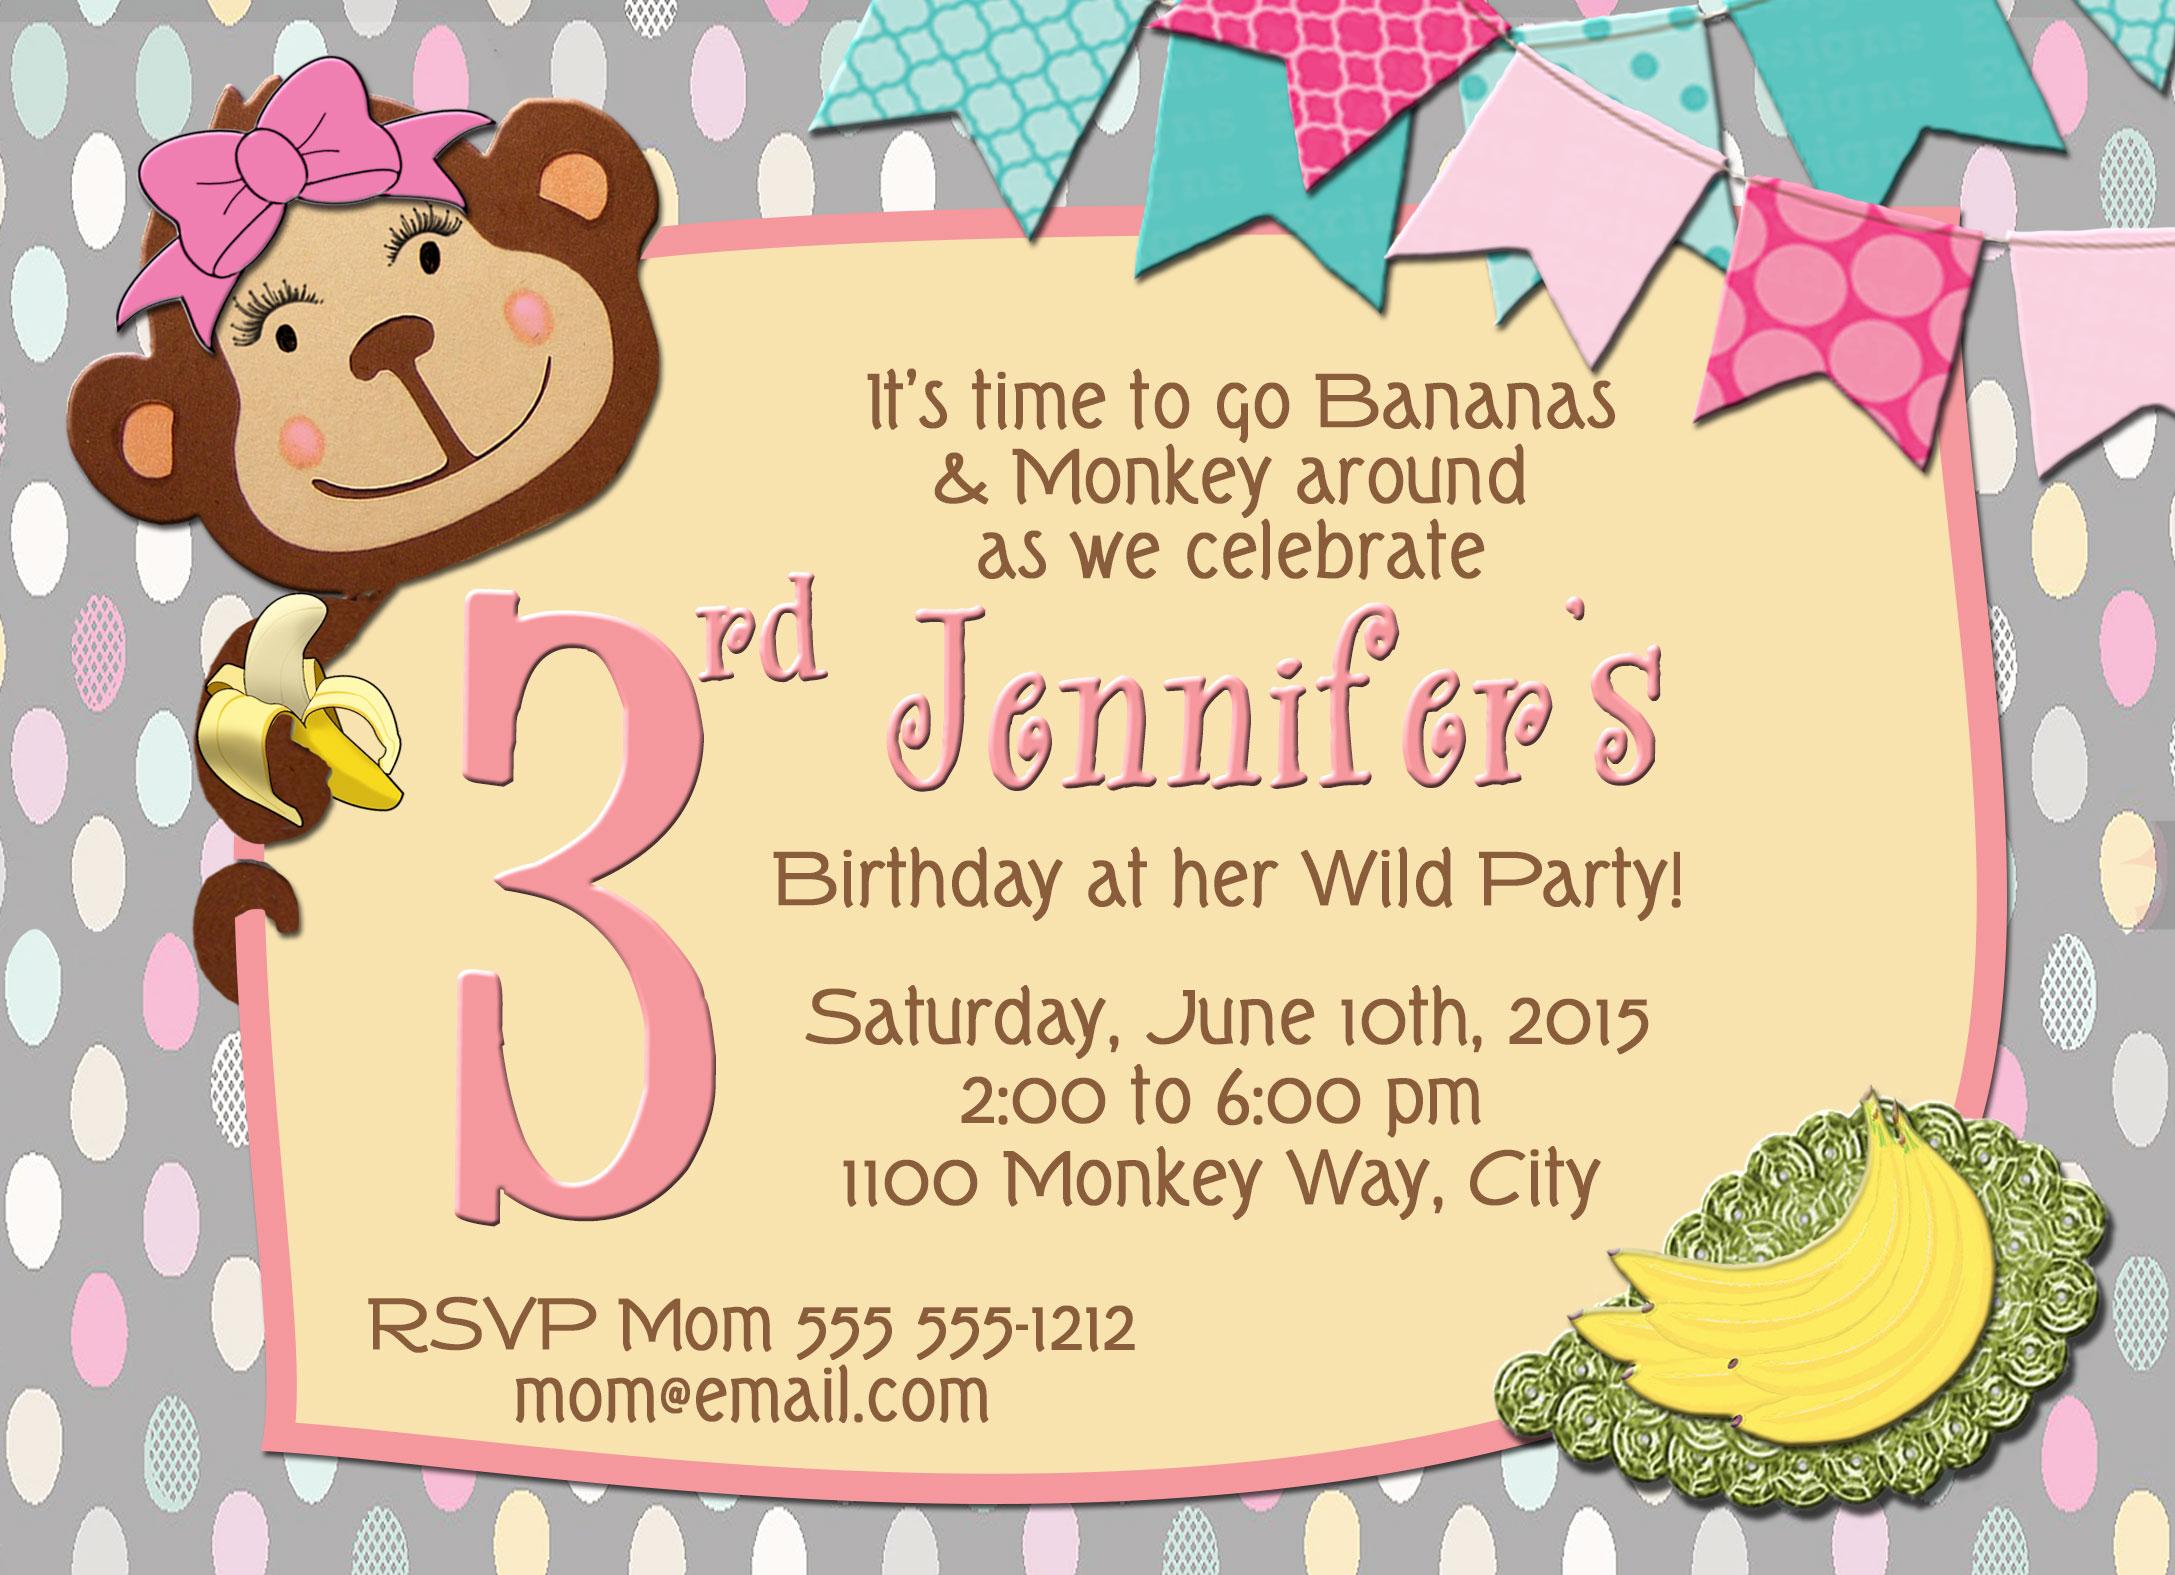 Monkey girl wild party personalized birthday invitation 2 sided monkey girl wild party personalized birthday invitation 2 sided birthday card party invitation filmwisefo